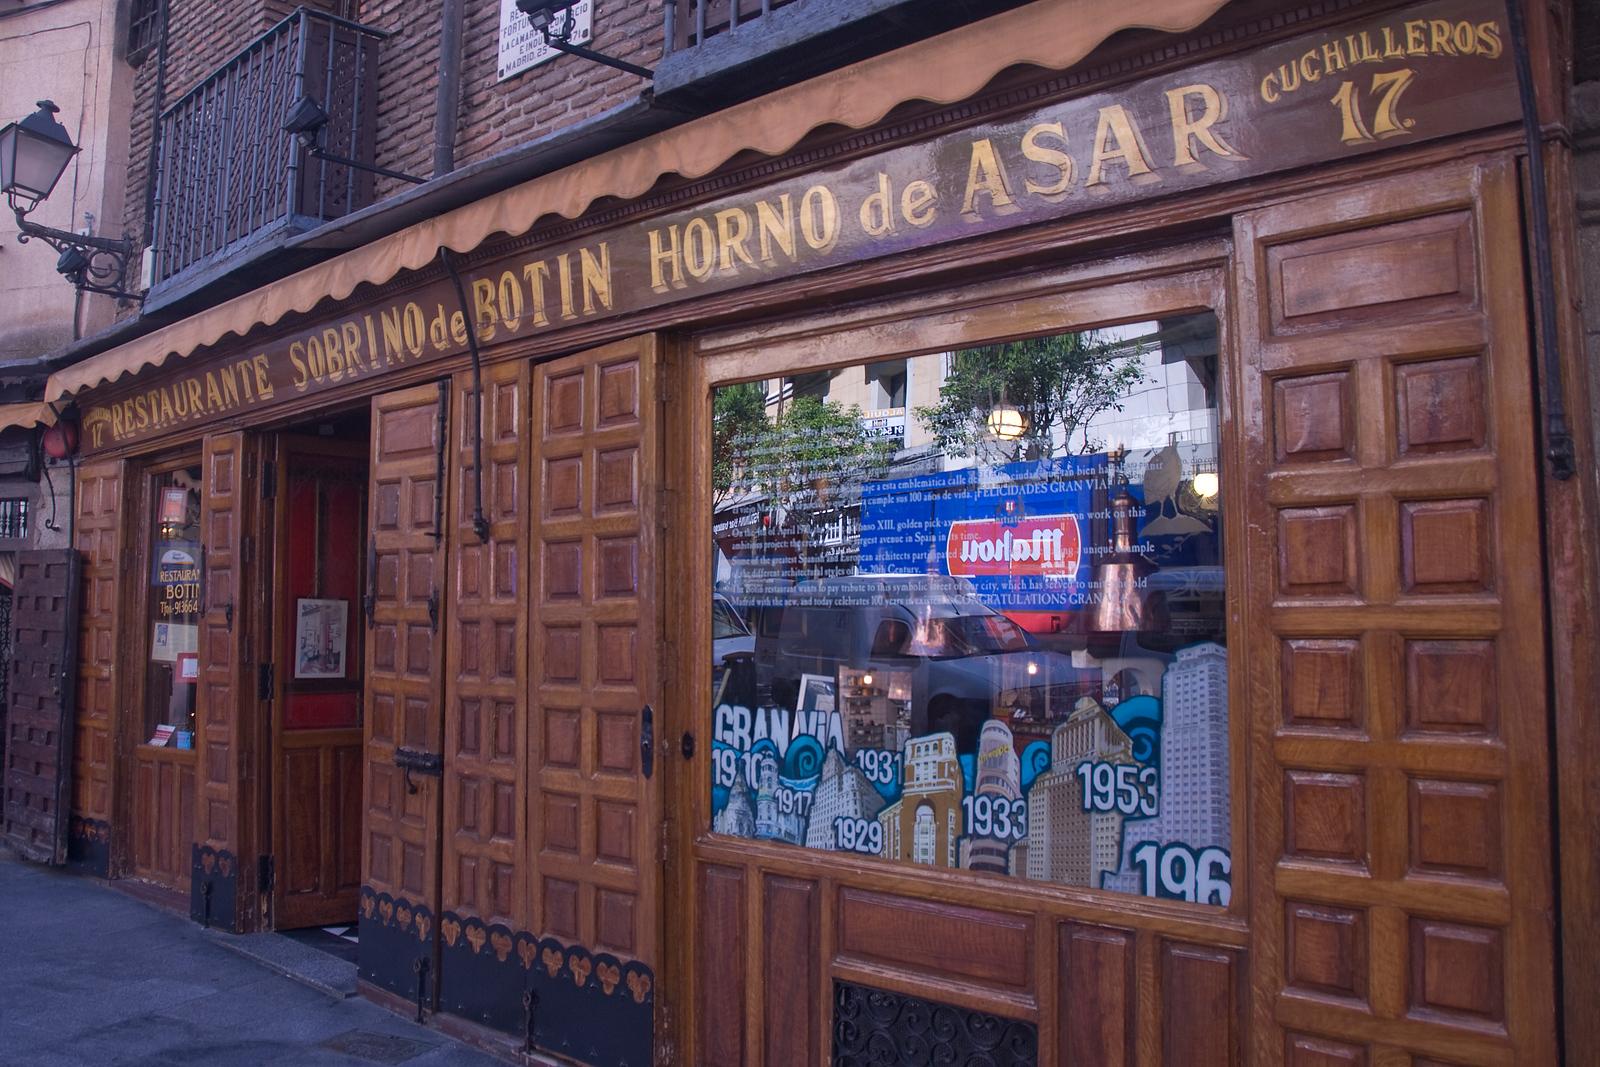 Botin Restaurant facade in Madrid, Spain